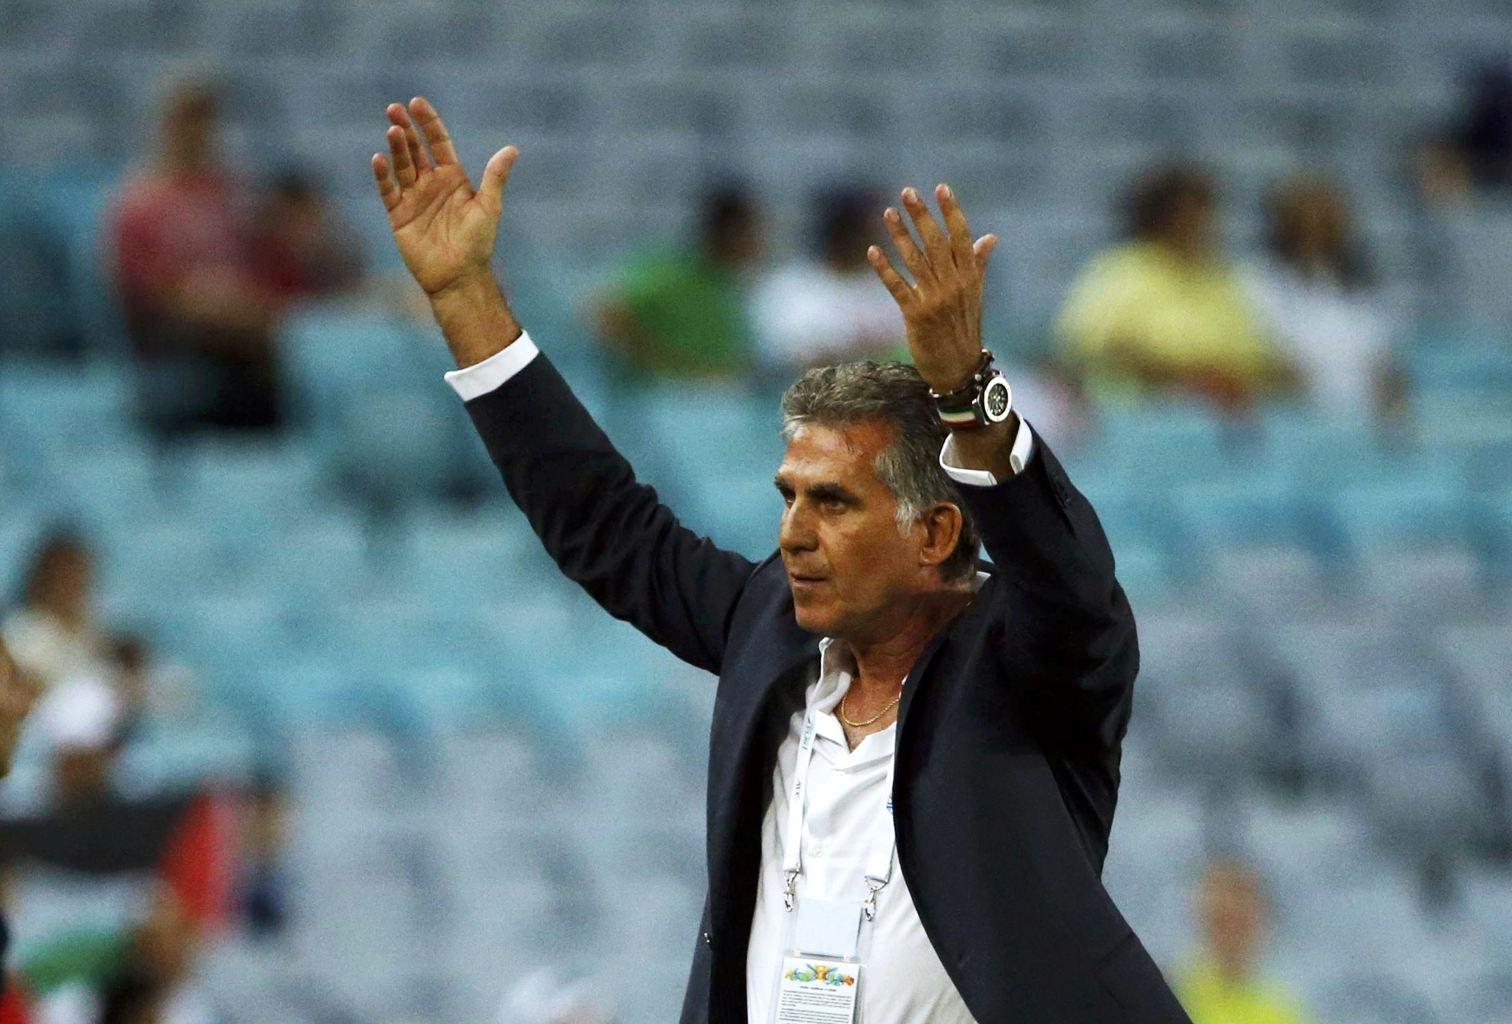 مقايسه محروميت كي روش درفوتبال پرتغال و يكه تازي او در ايران